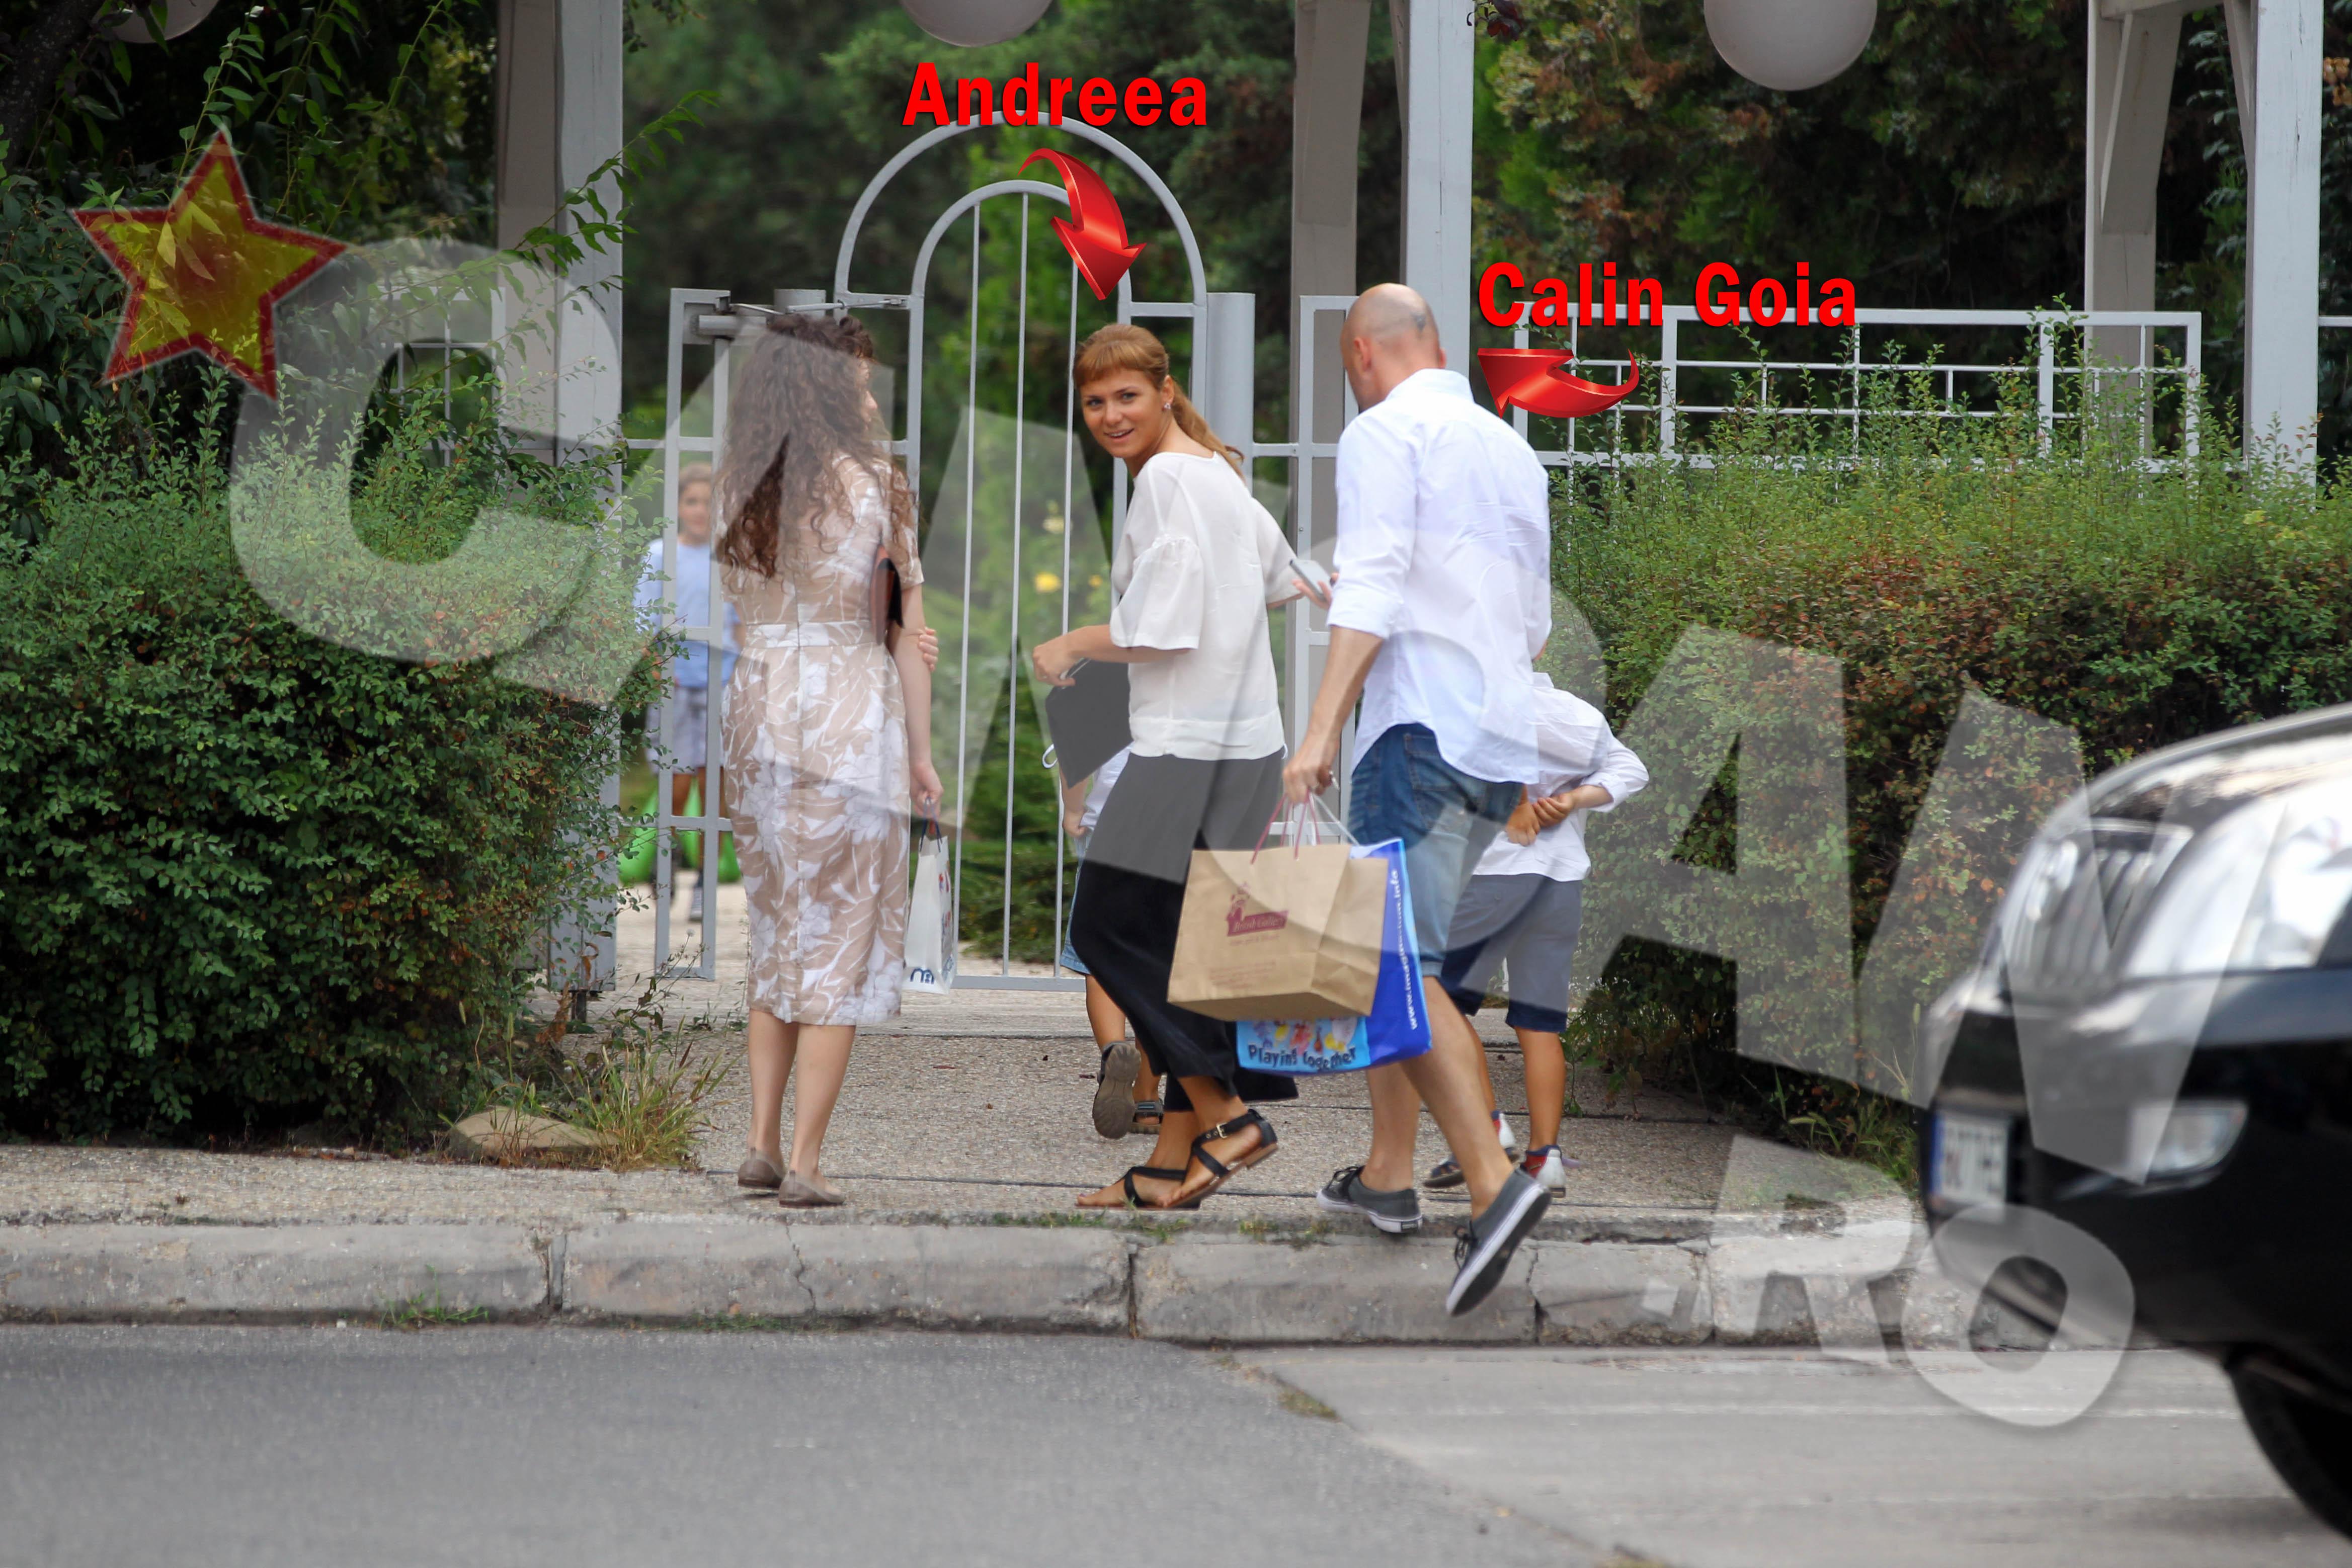 Prezenta destul de rara, Andreea Goia prefera sa mentina discretia